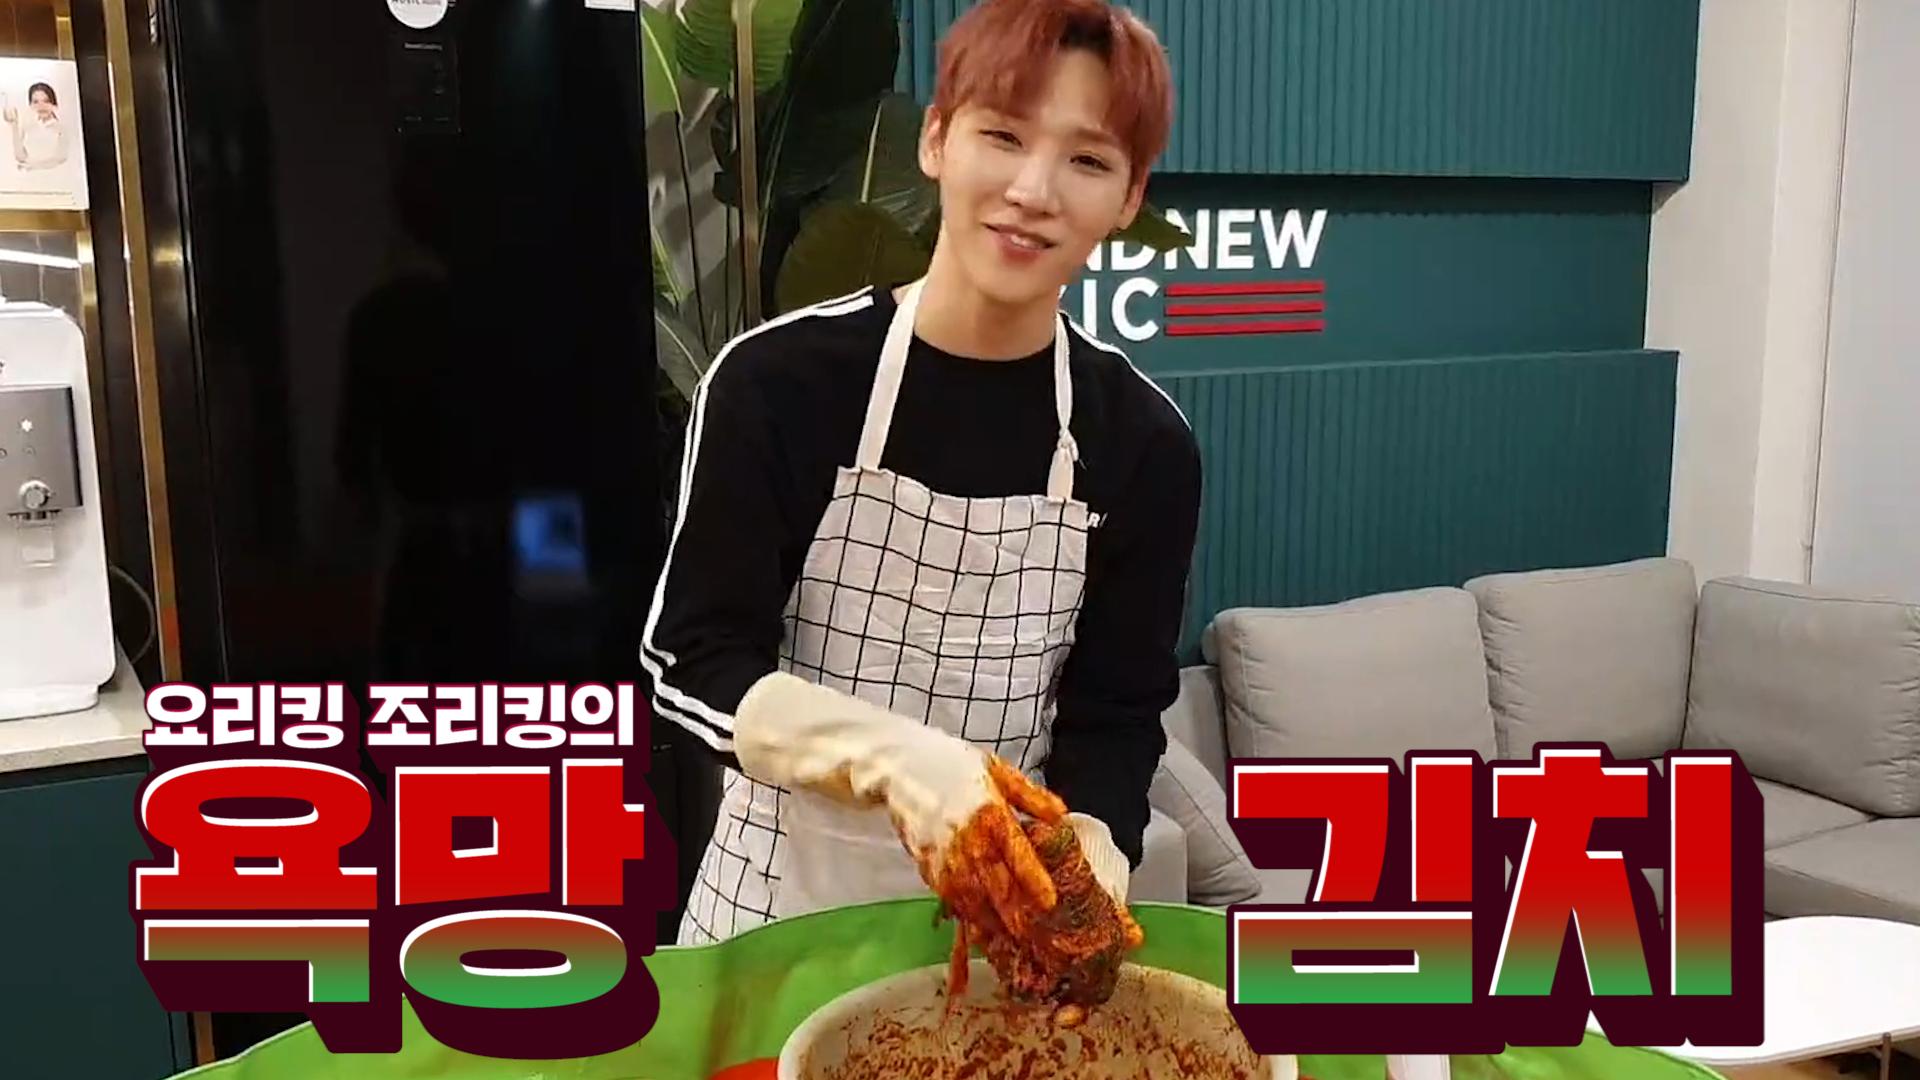 [AB6IX] 떡잎부터 남달랐던 요리킹 조리킹의 욕망김치🥬 (Woong making kimchi)